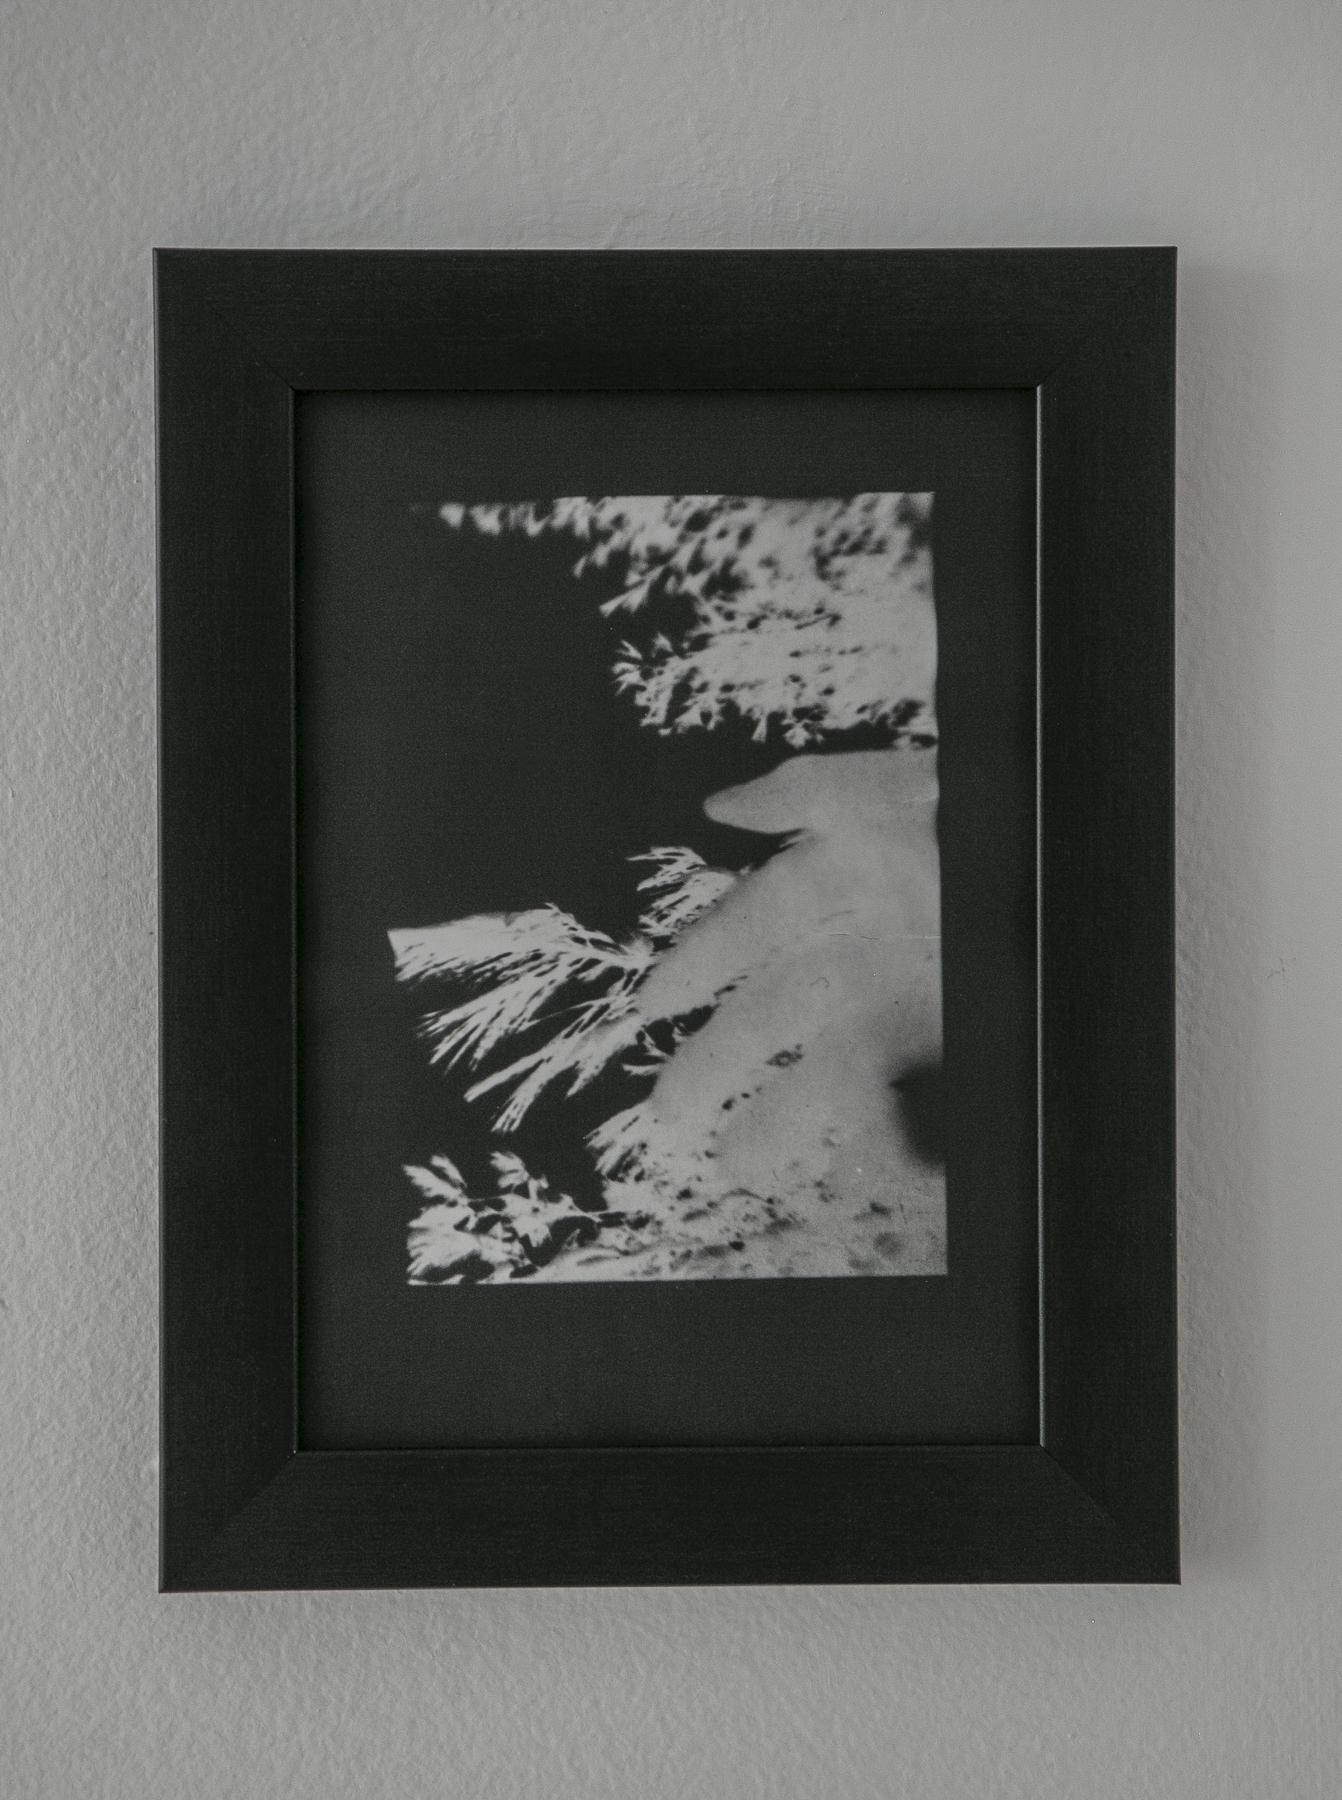 Kioto Aoki, Lost Negative, Silver gelatin prints, 2019